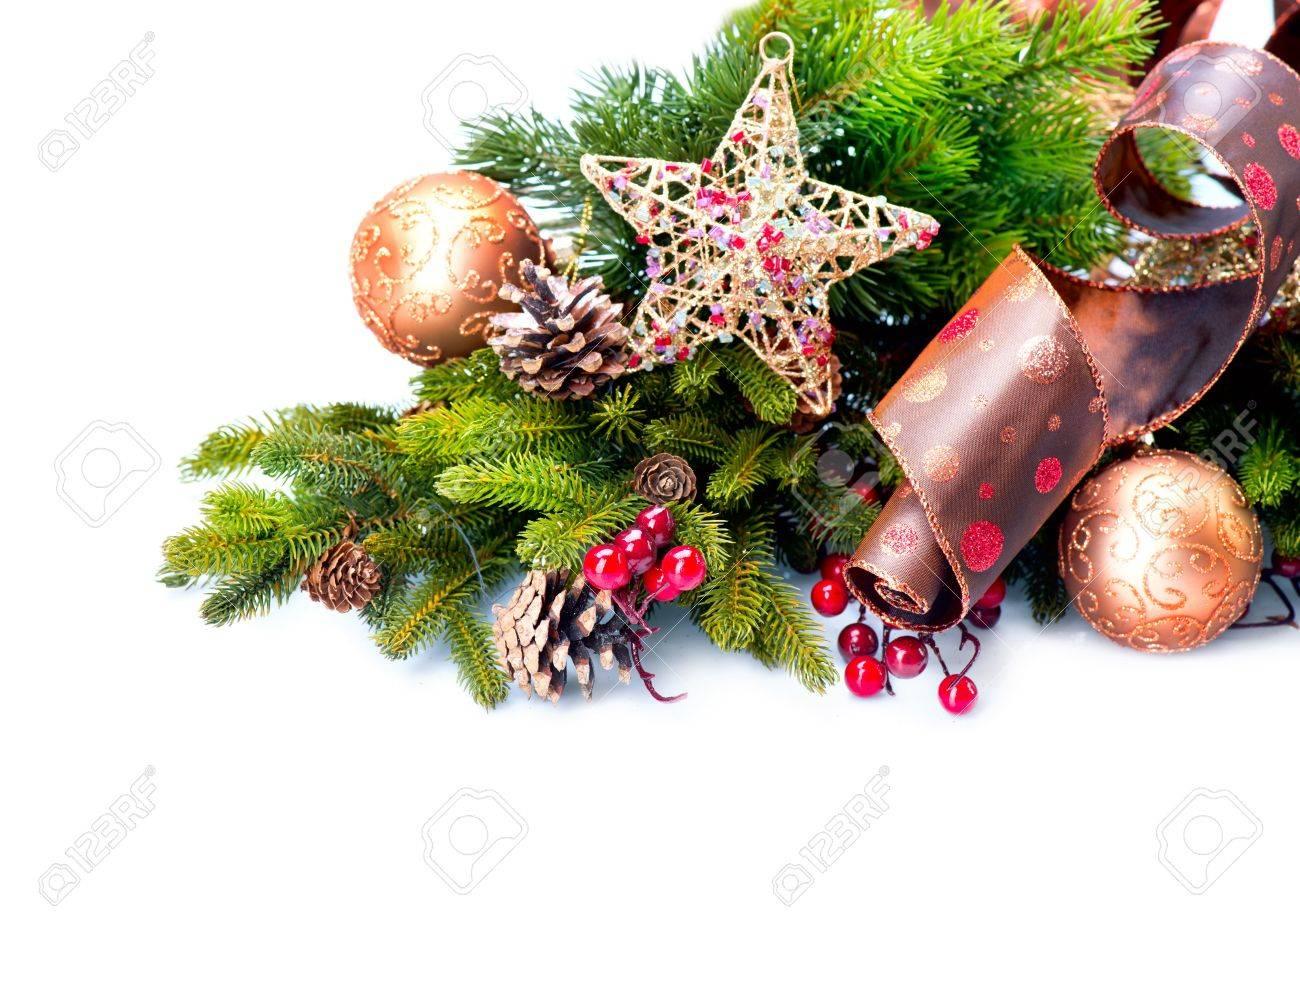 Christmas Decoration  Holiday Decorations Isolated on White Stock Photo - 16825547